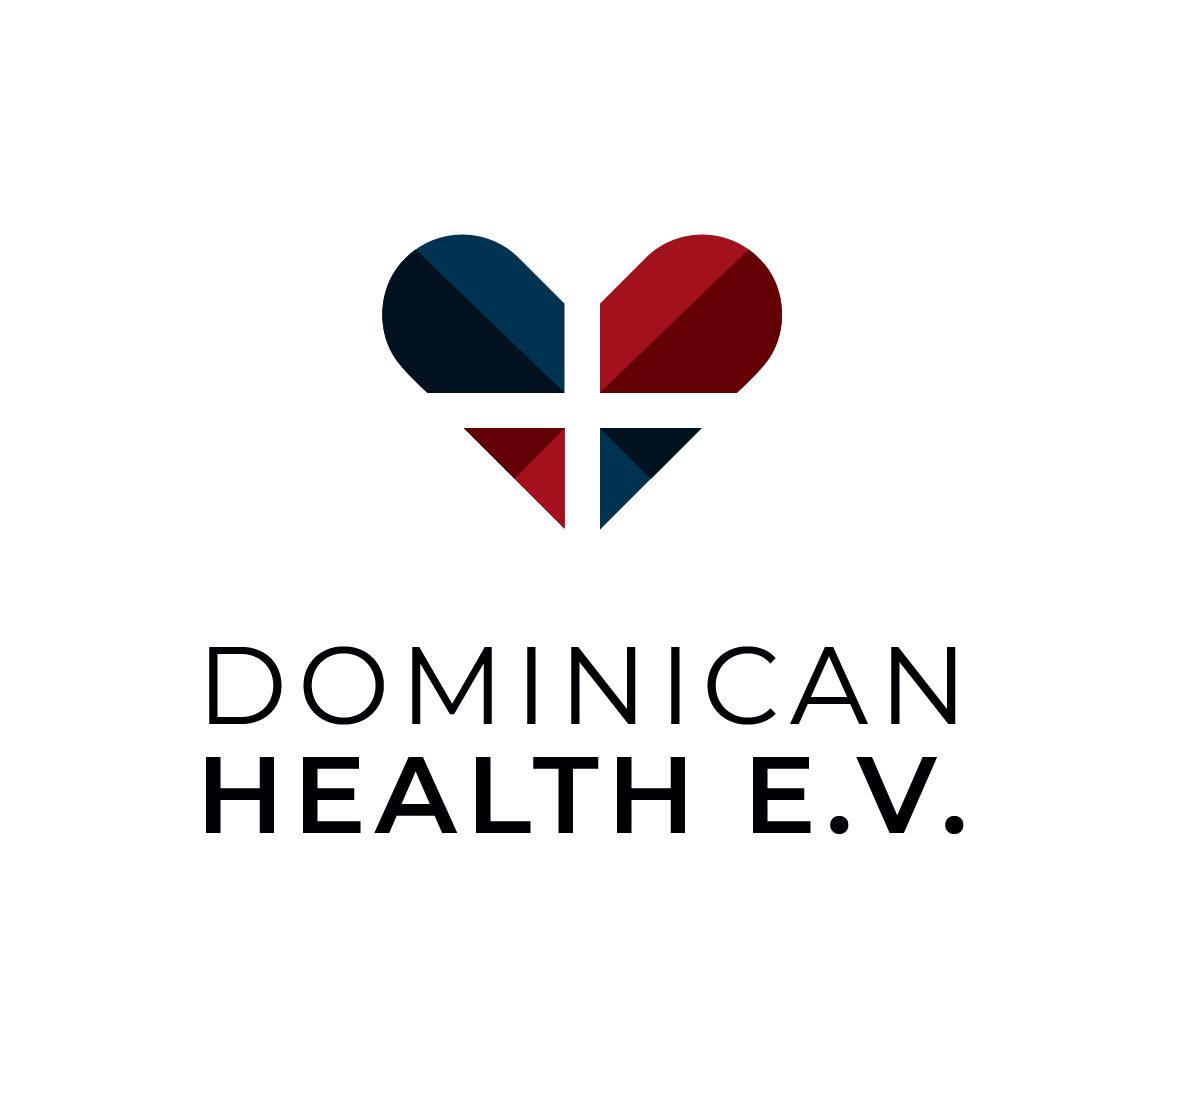 Dominican Health